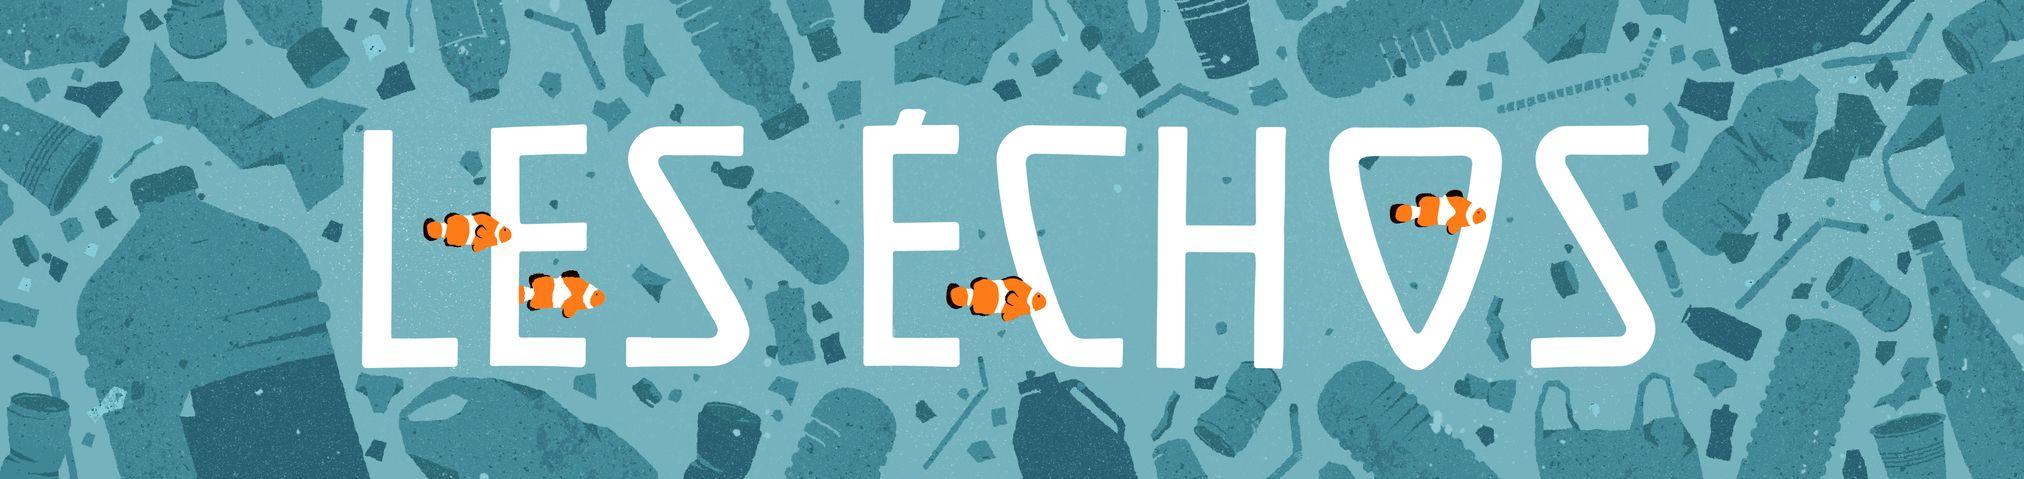 garance-illustration-Les-Echos-Plastic-pollution_web